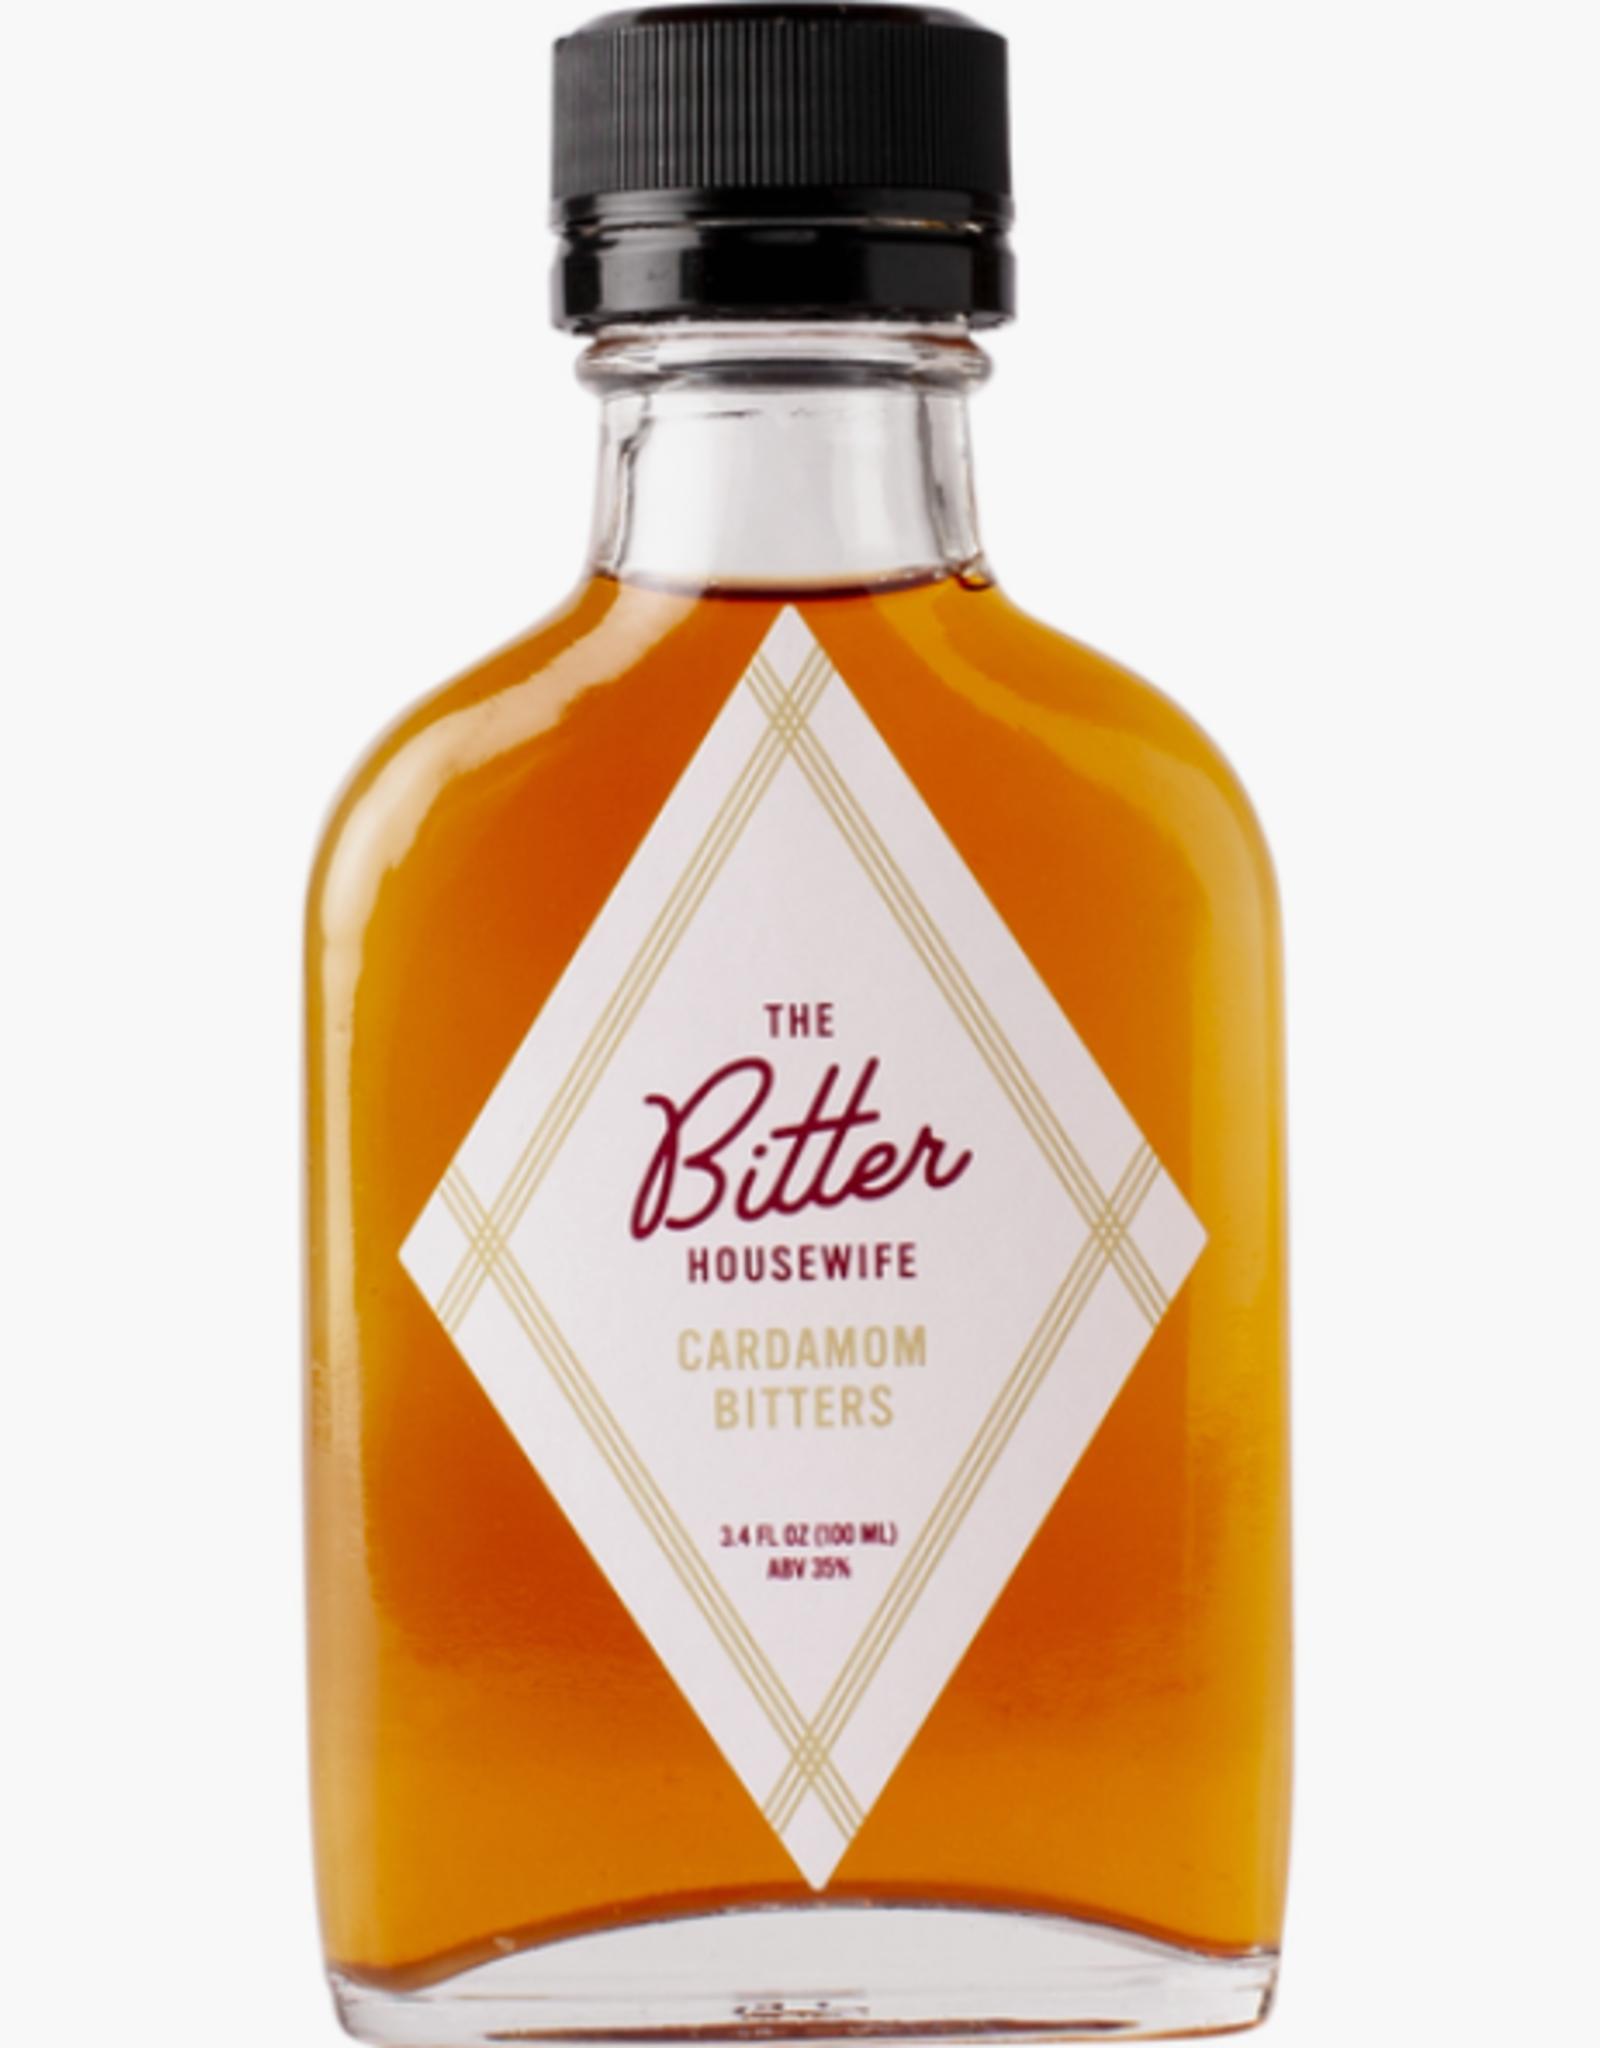 Cardamom Bitters